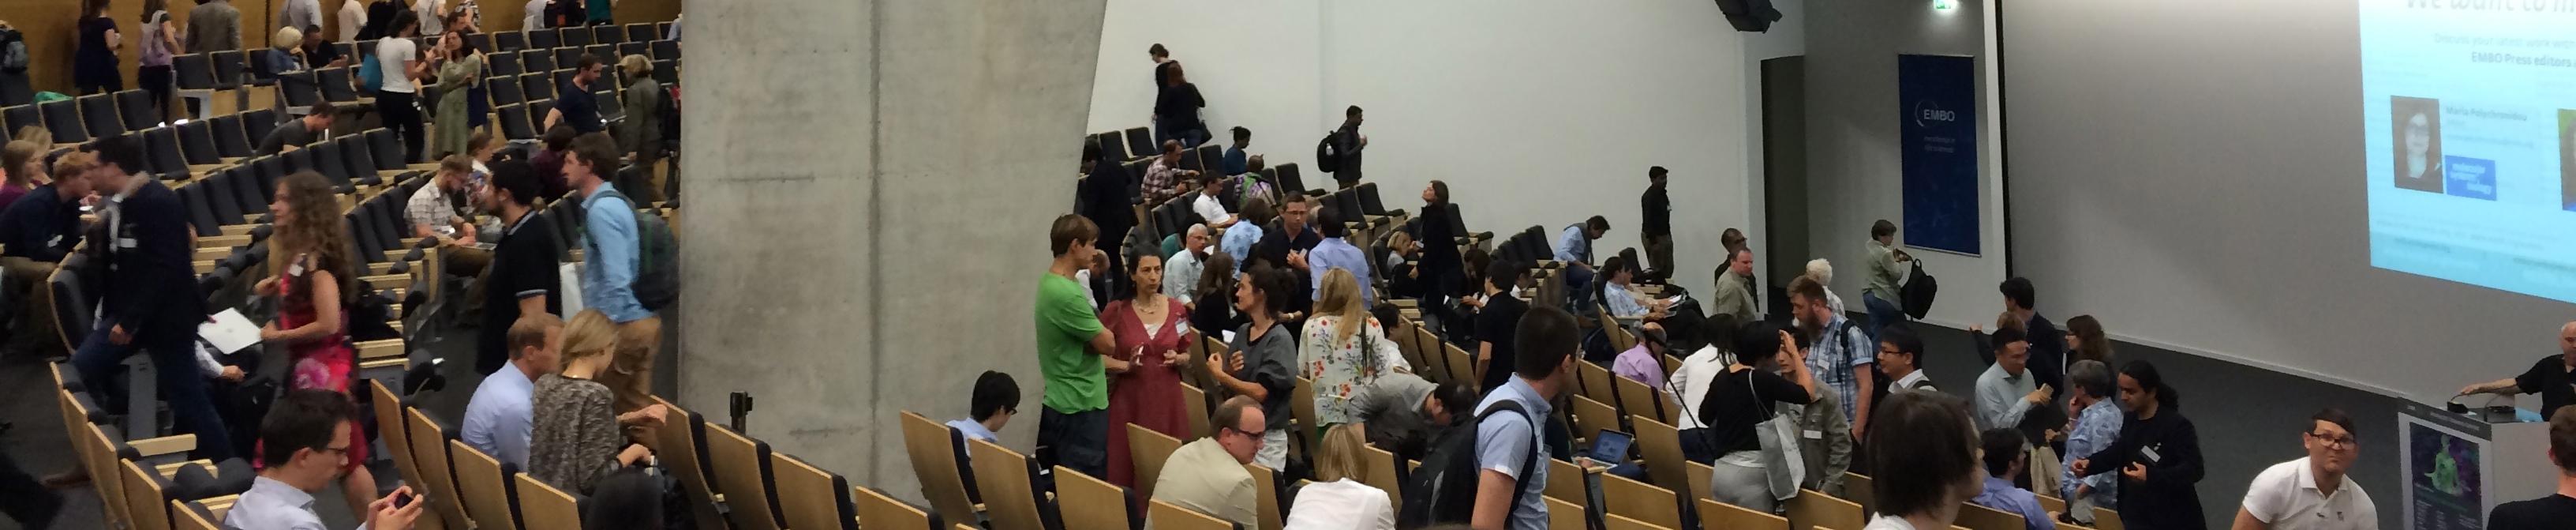 EMBL conference